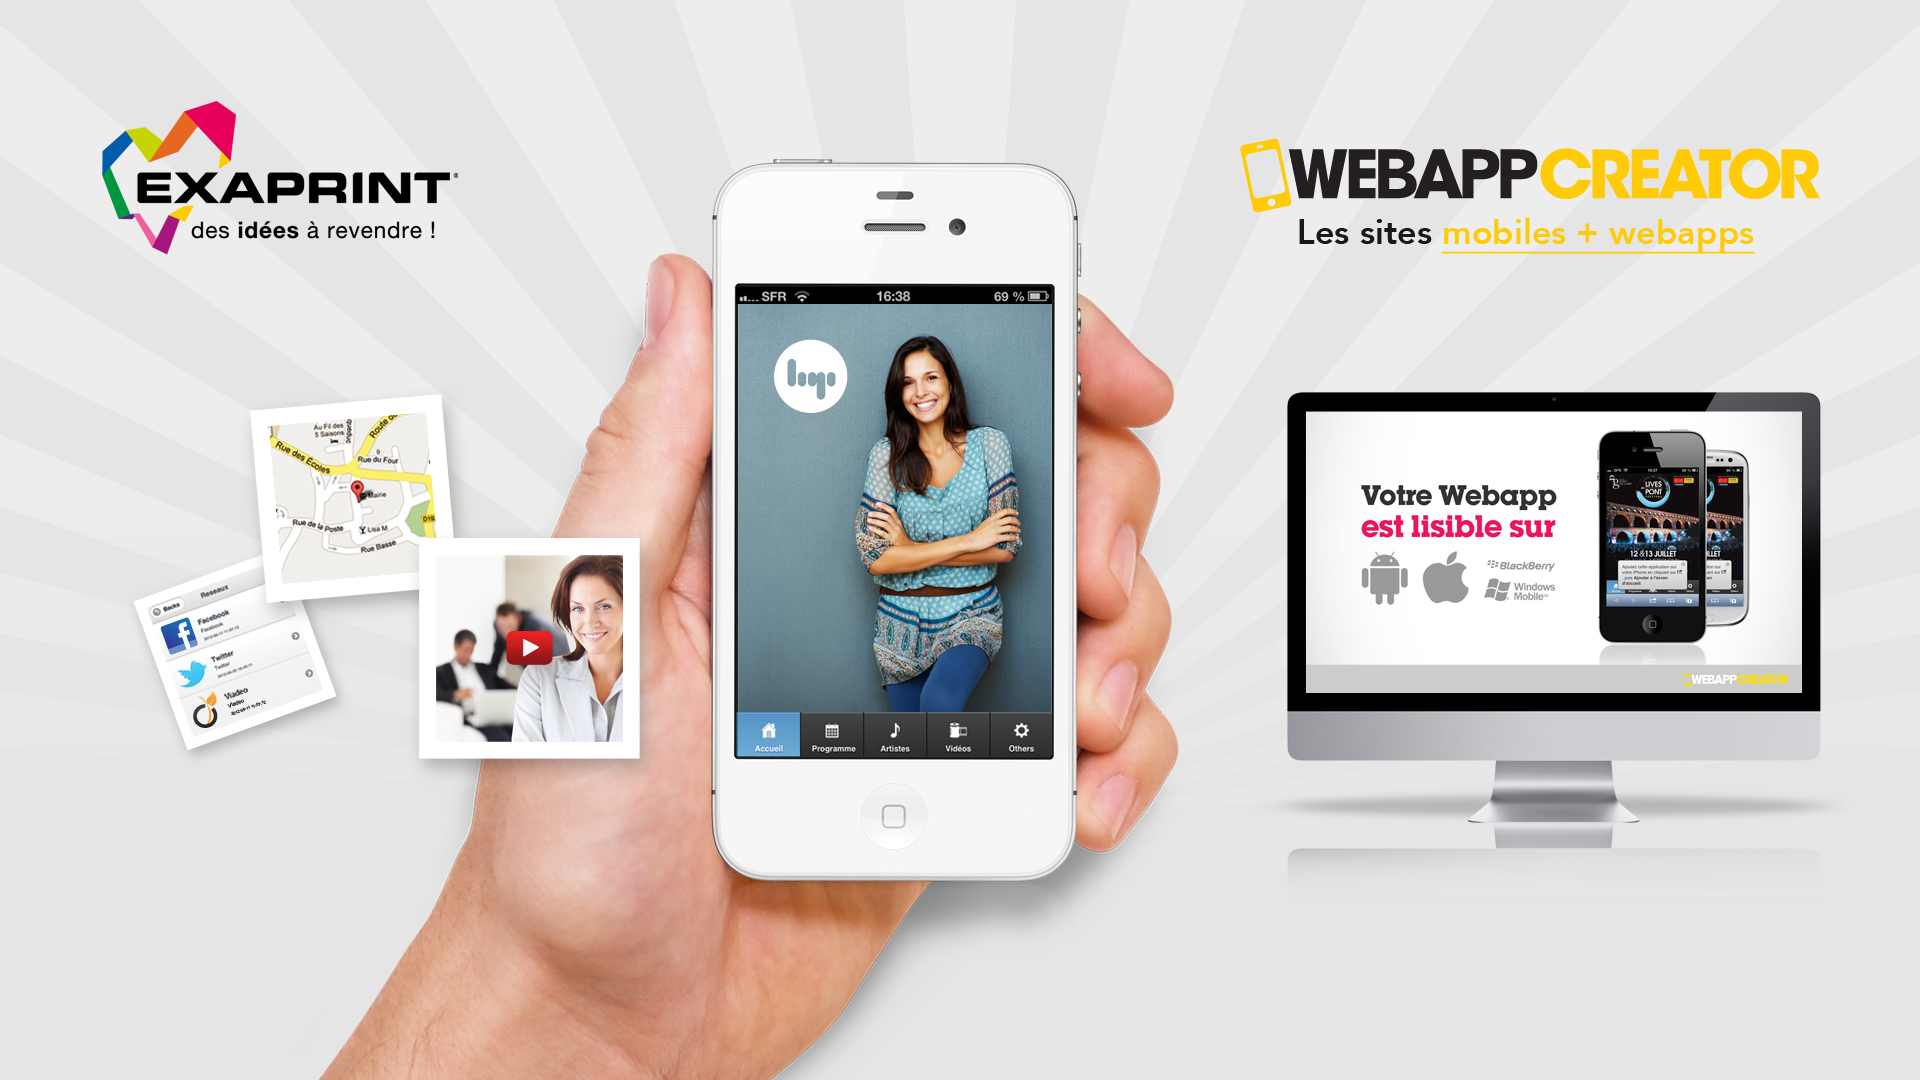 exaprint-webappcreator-creation-concept-visuel-mailing-site-communication-caconcept-alexis-cretin-graphiste-bis